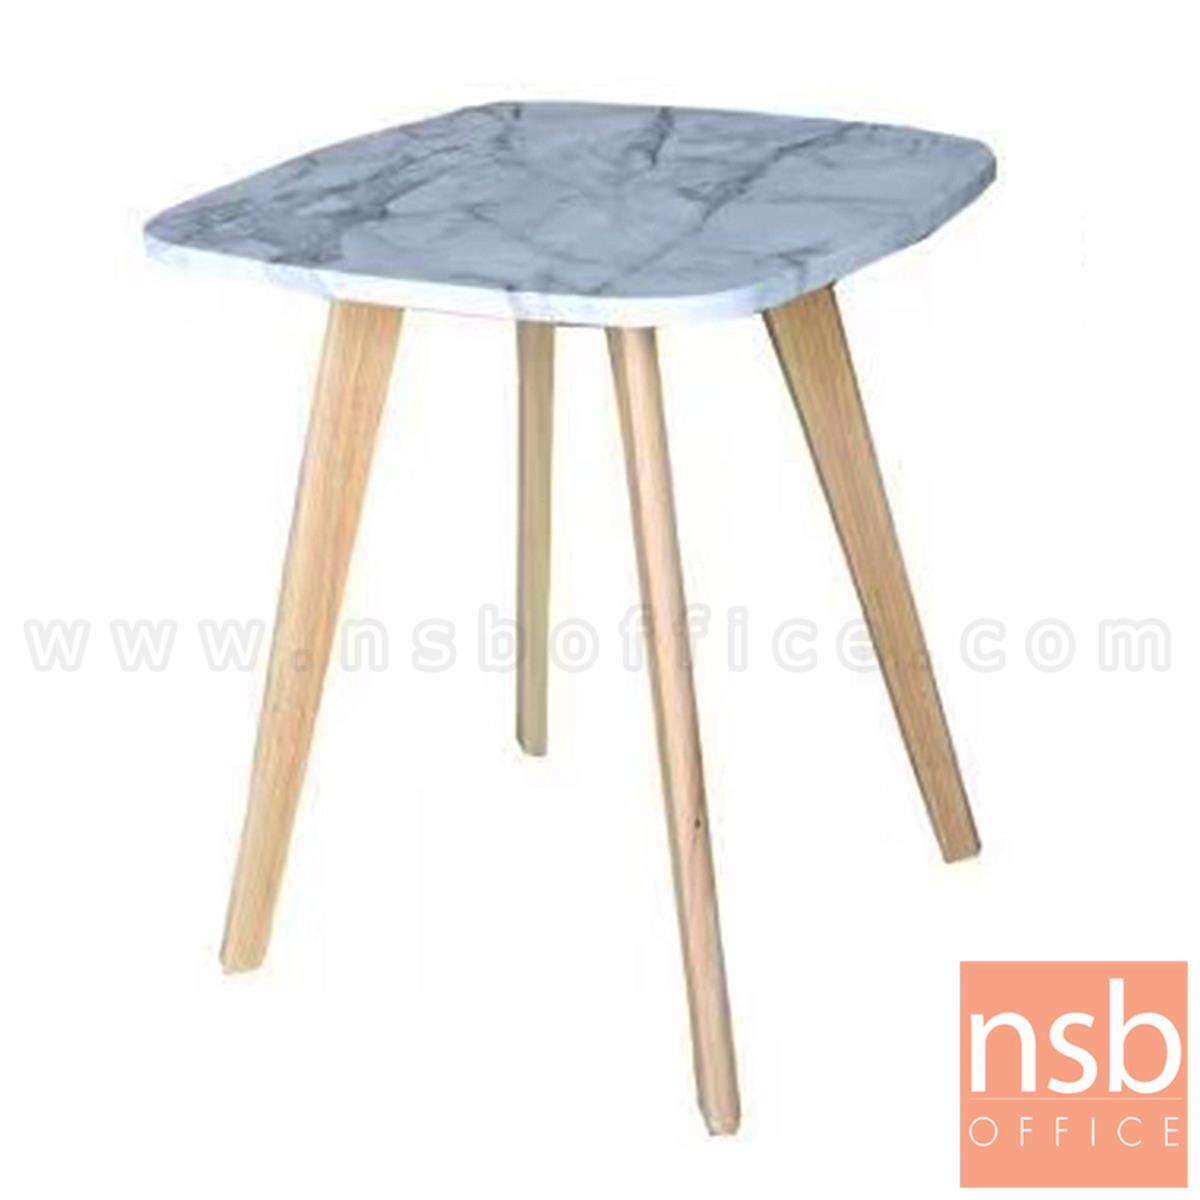 B13A288:โต๊ะกลางไม้ รุ่น Benviar (เบนเวียร์) ขนาด 53H cm. ขาไม้